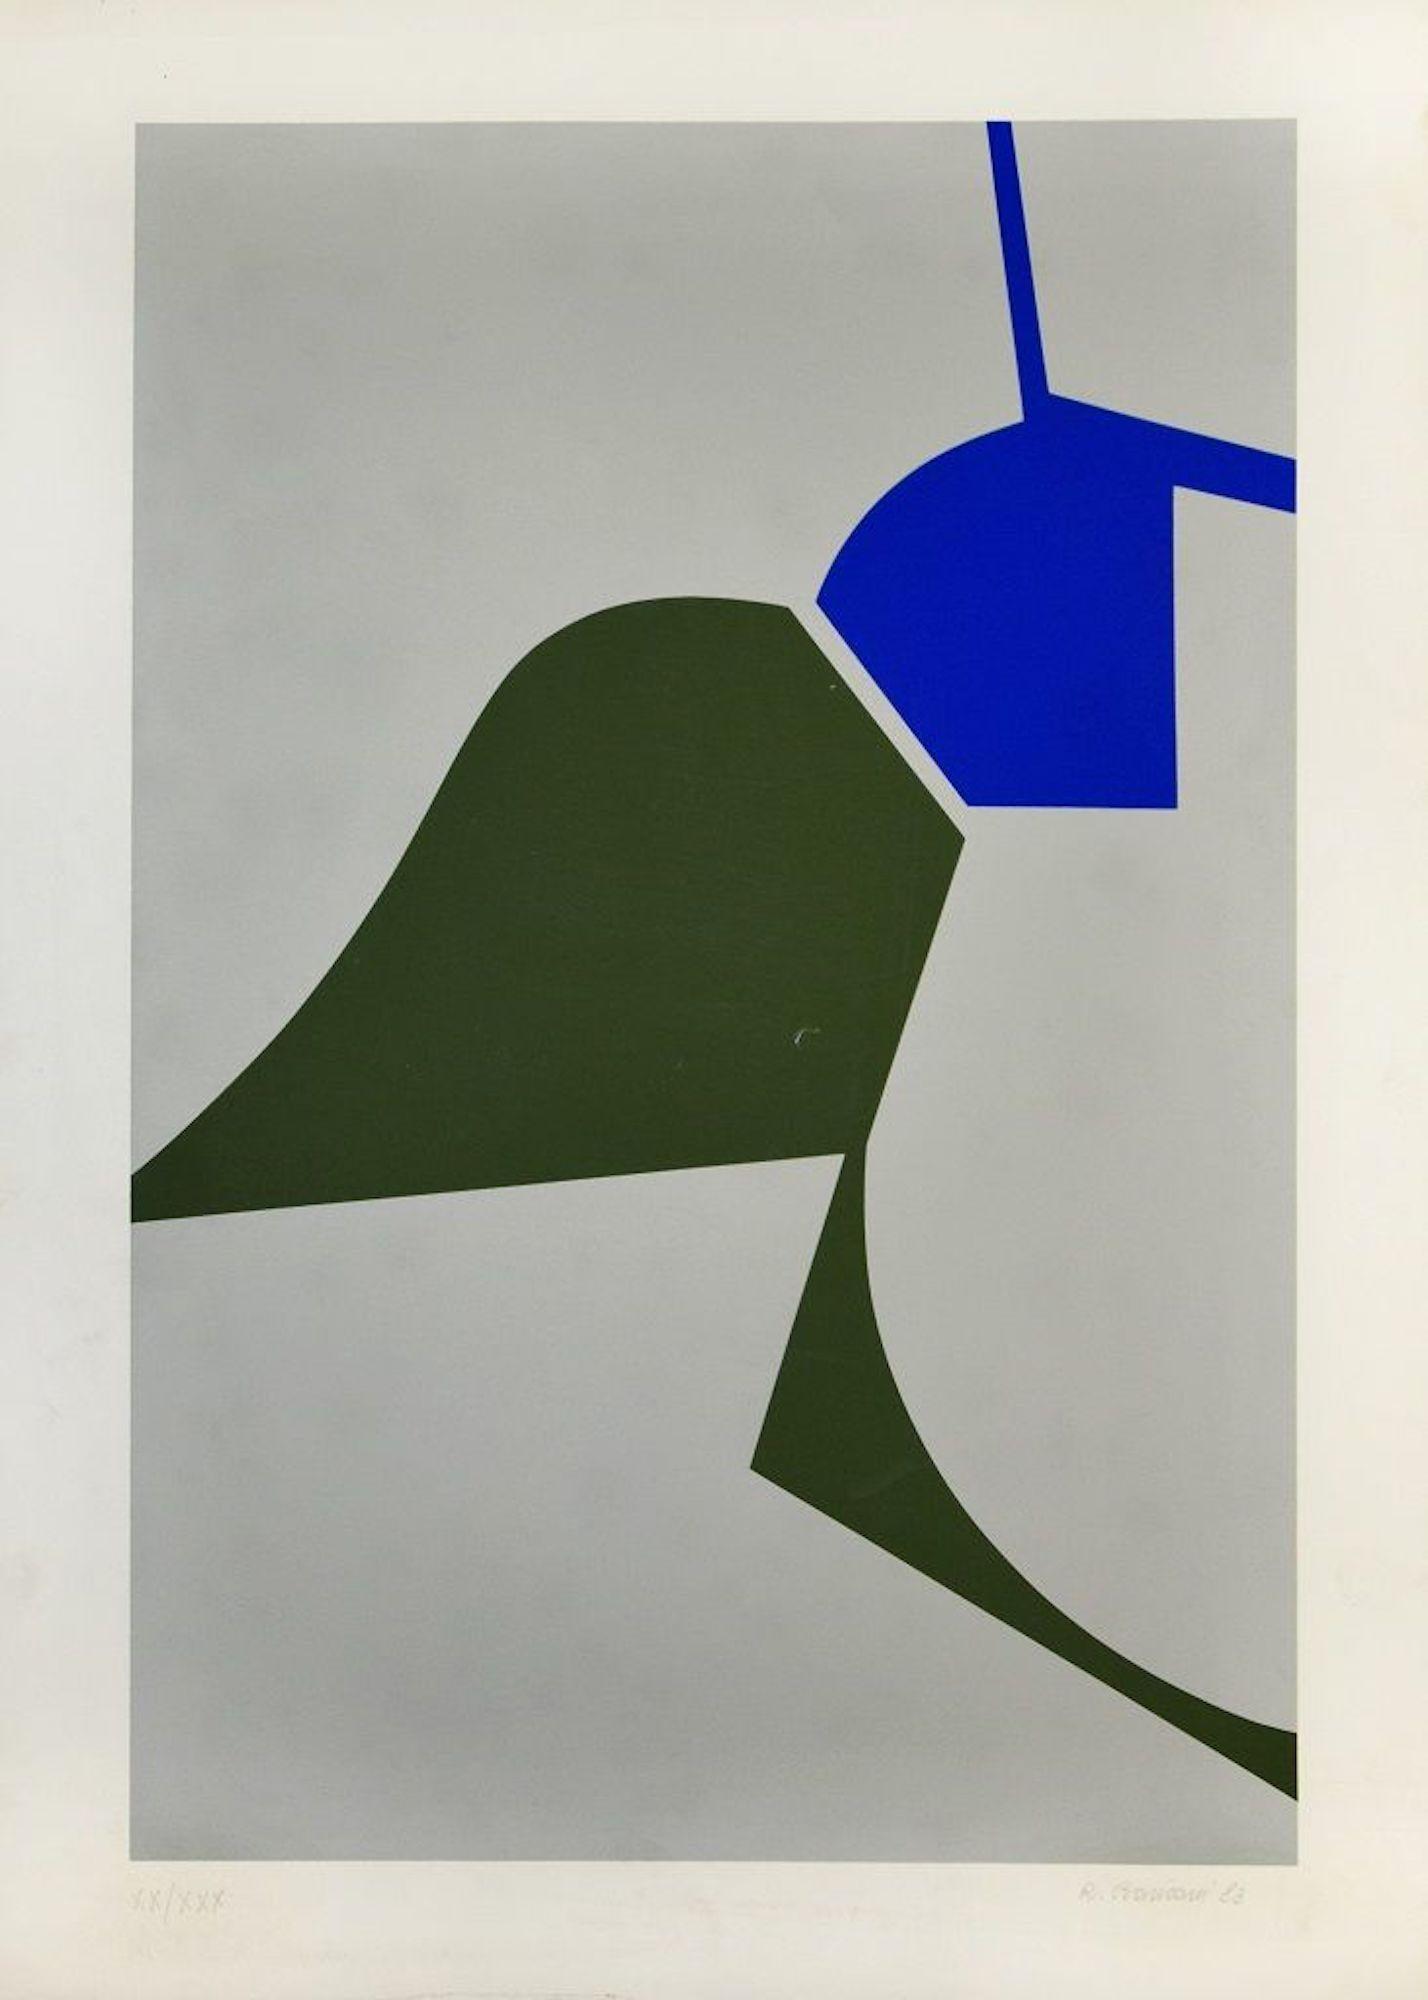 Mediterranean Abstract - Original Screen Print by Renato Barisani - 1983